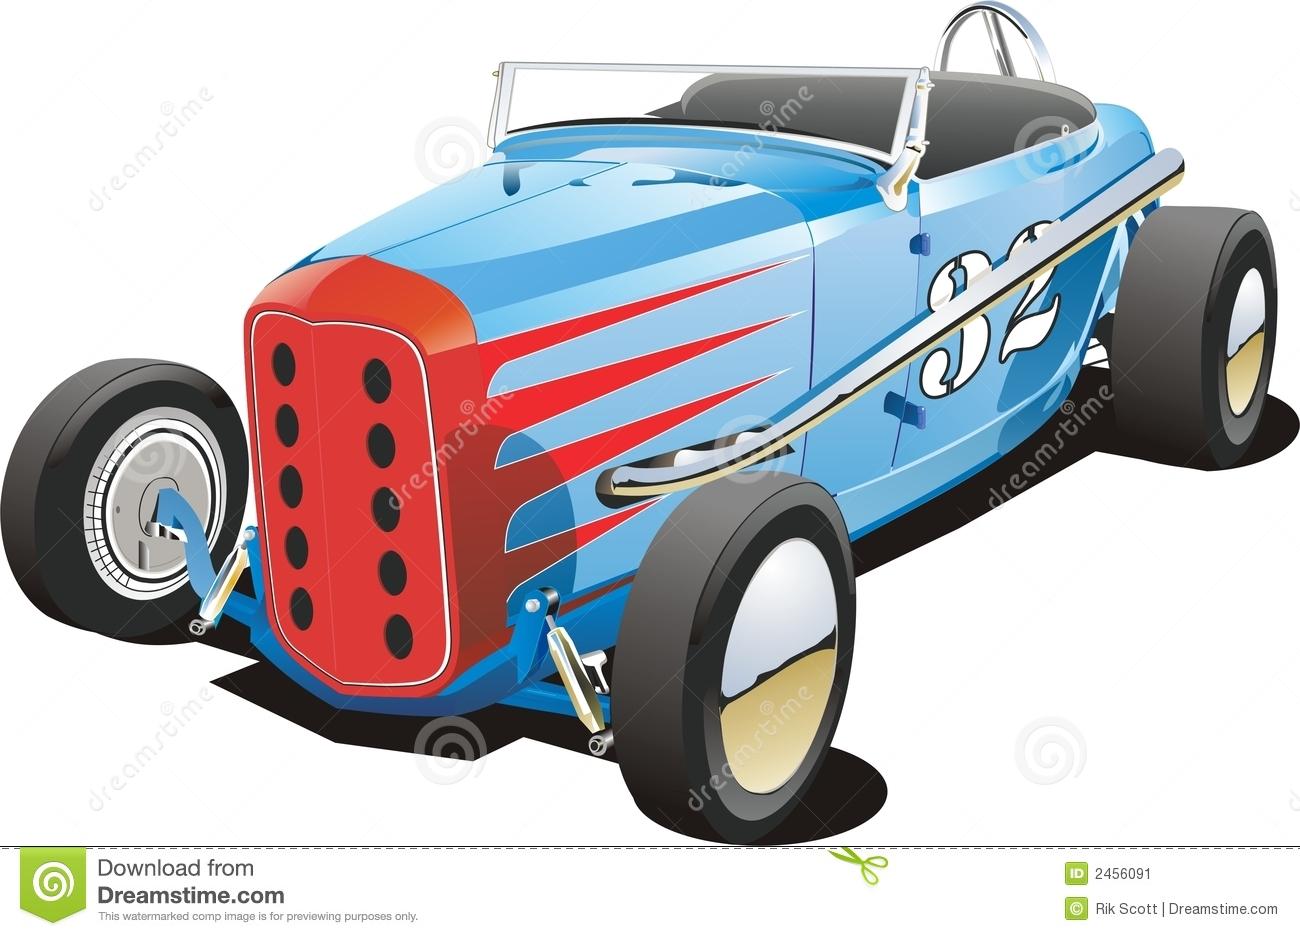 Dirt track car clipart.